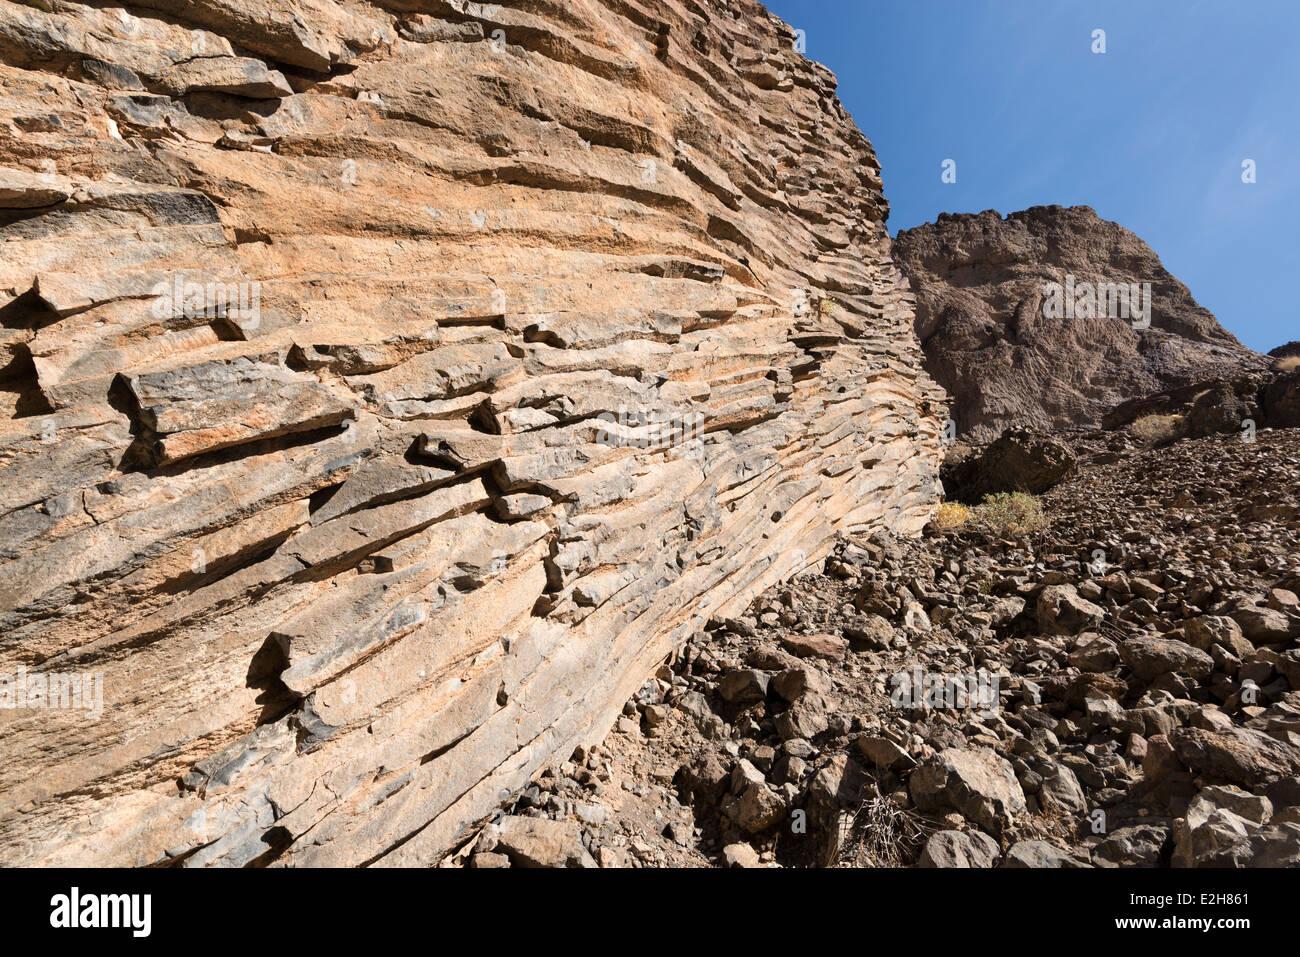 Columnar basalt, Grand Canyon, Arizona. - Stock Image